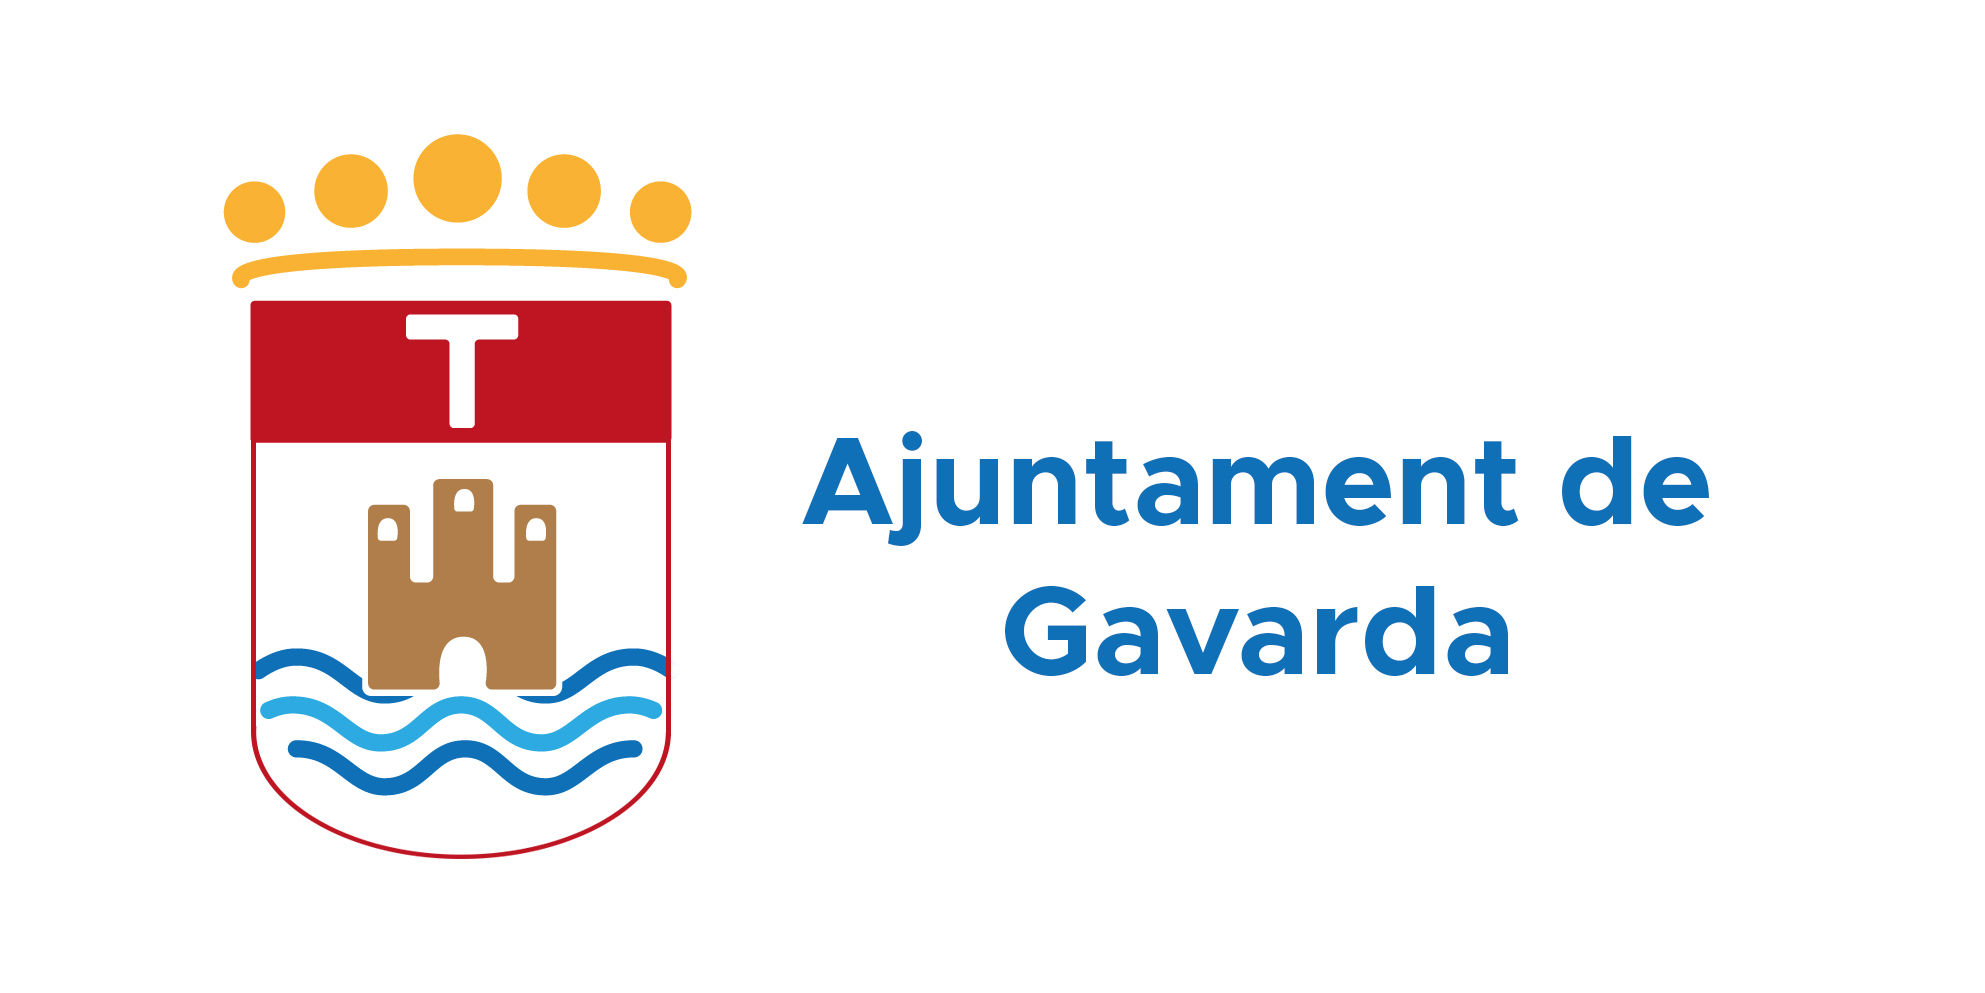 Ajuntament de Gavarda